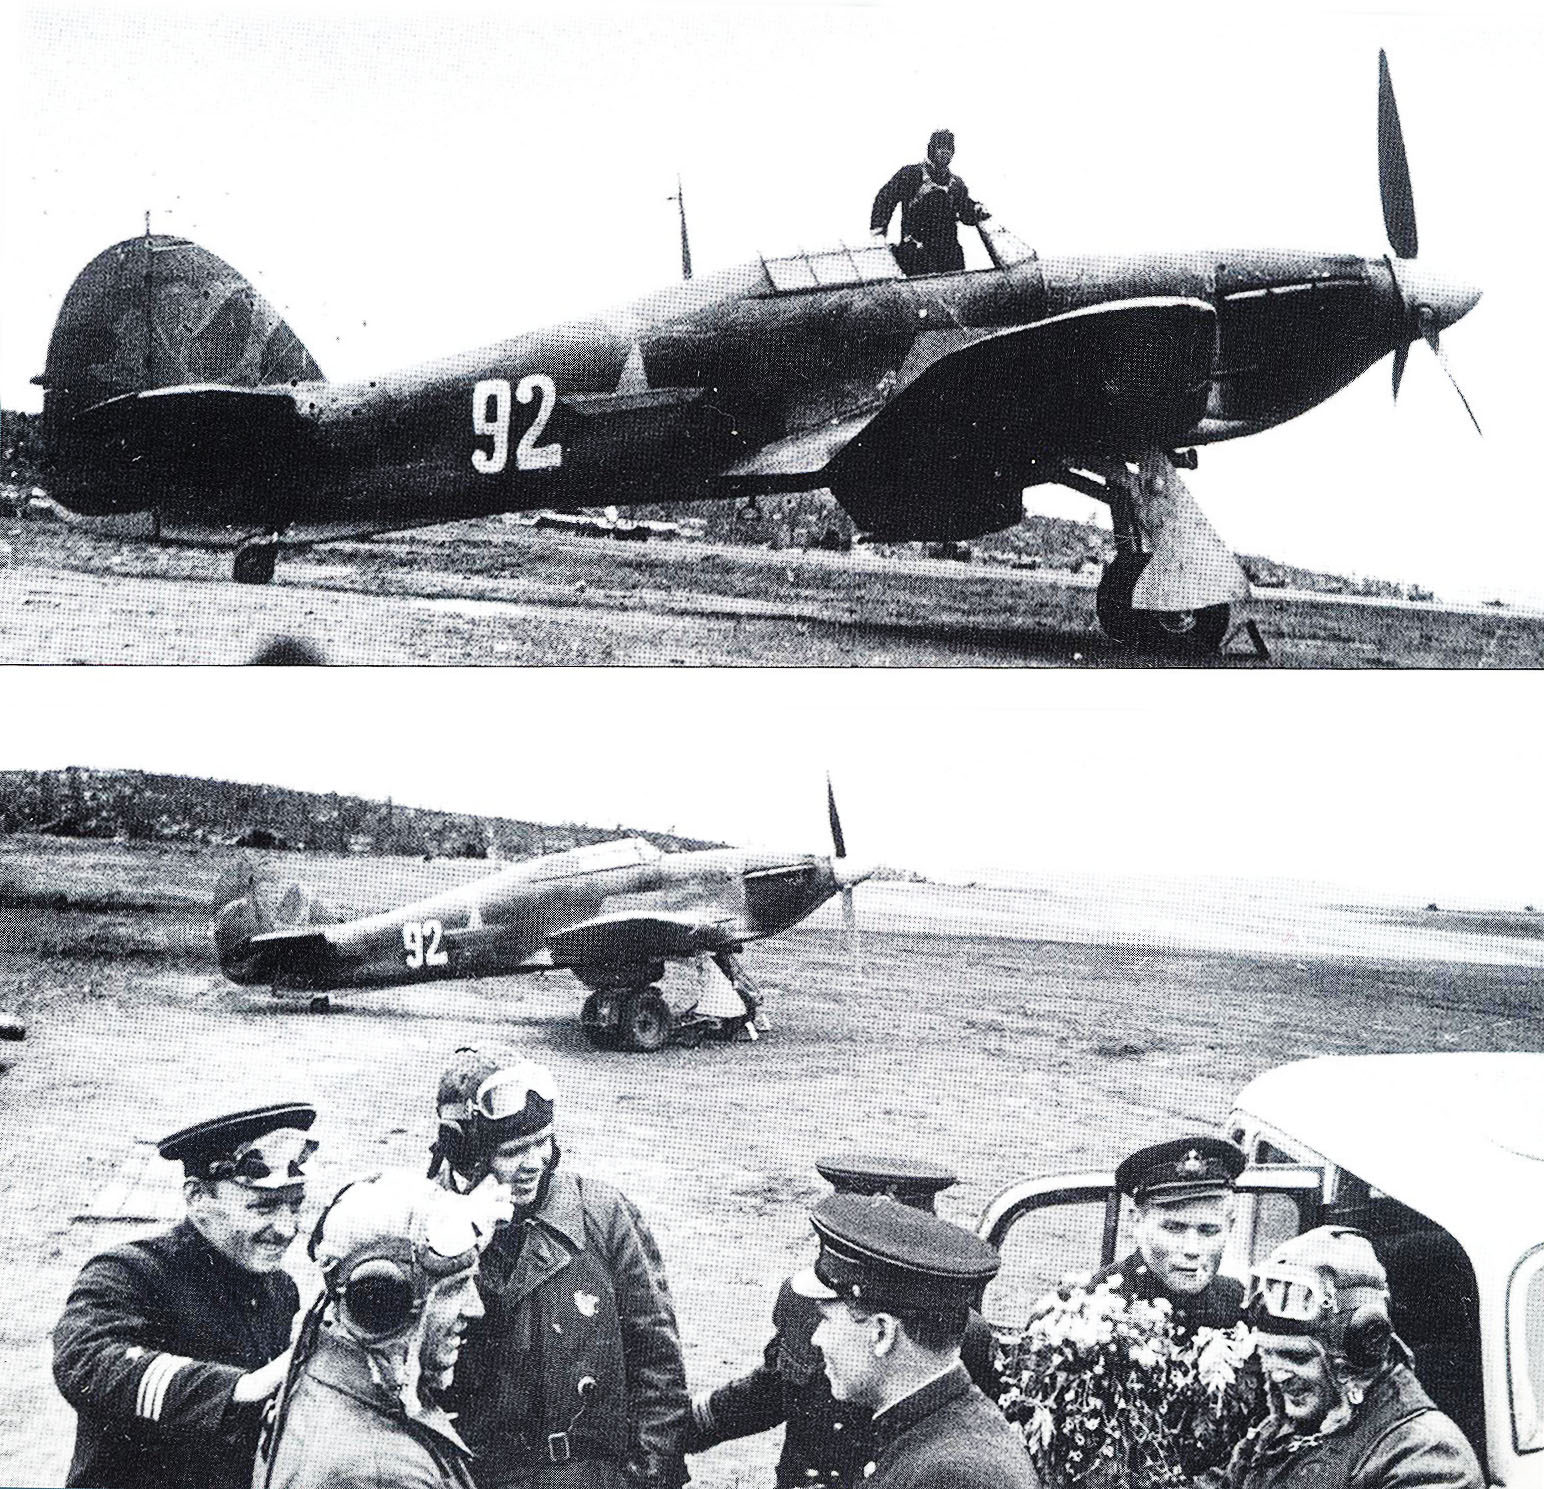 Hurricane USSR 78IAP or 2Giap VVS SF White 92 Russia 1942 01